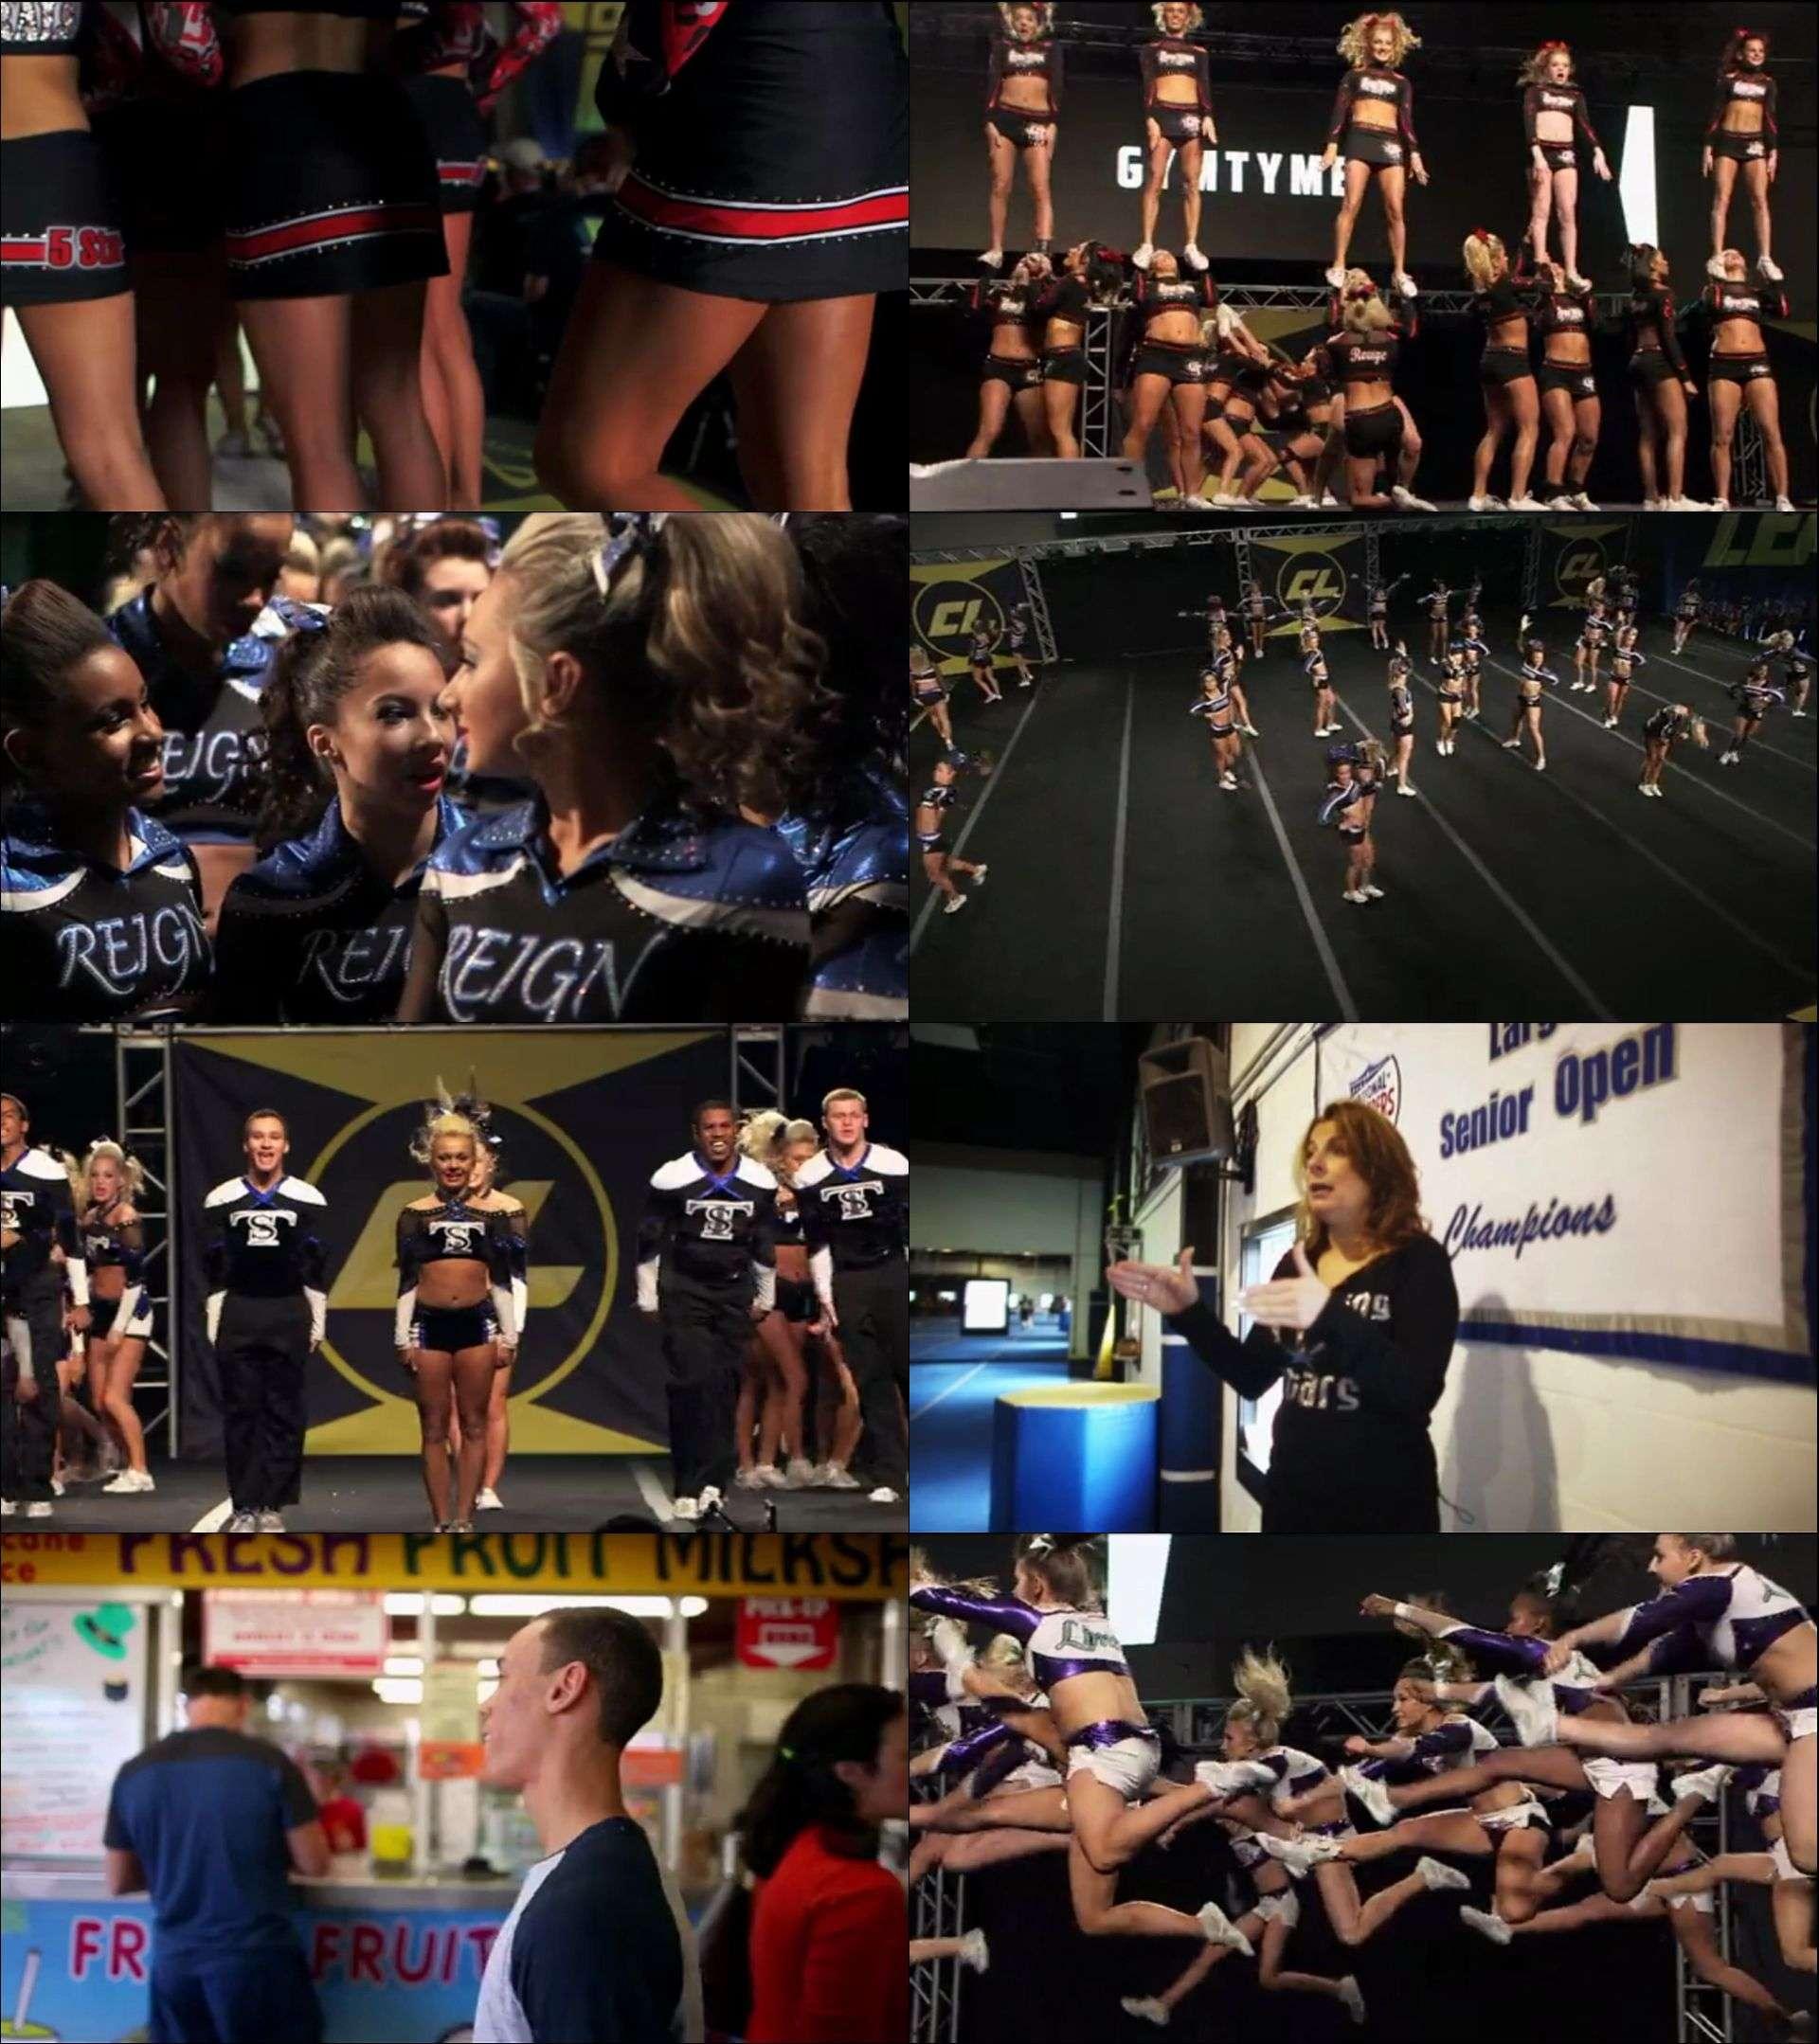 Nfinity Champions League Cheerleading Event (2014) türkçe dublaj belgesel indir